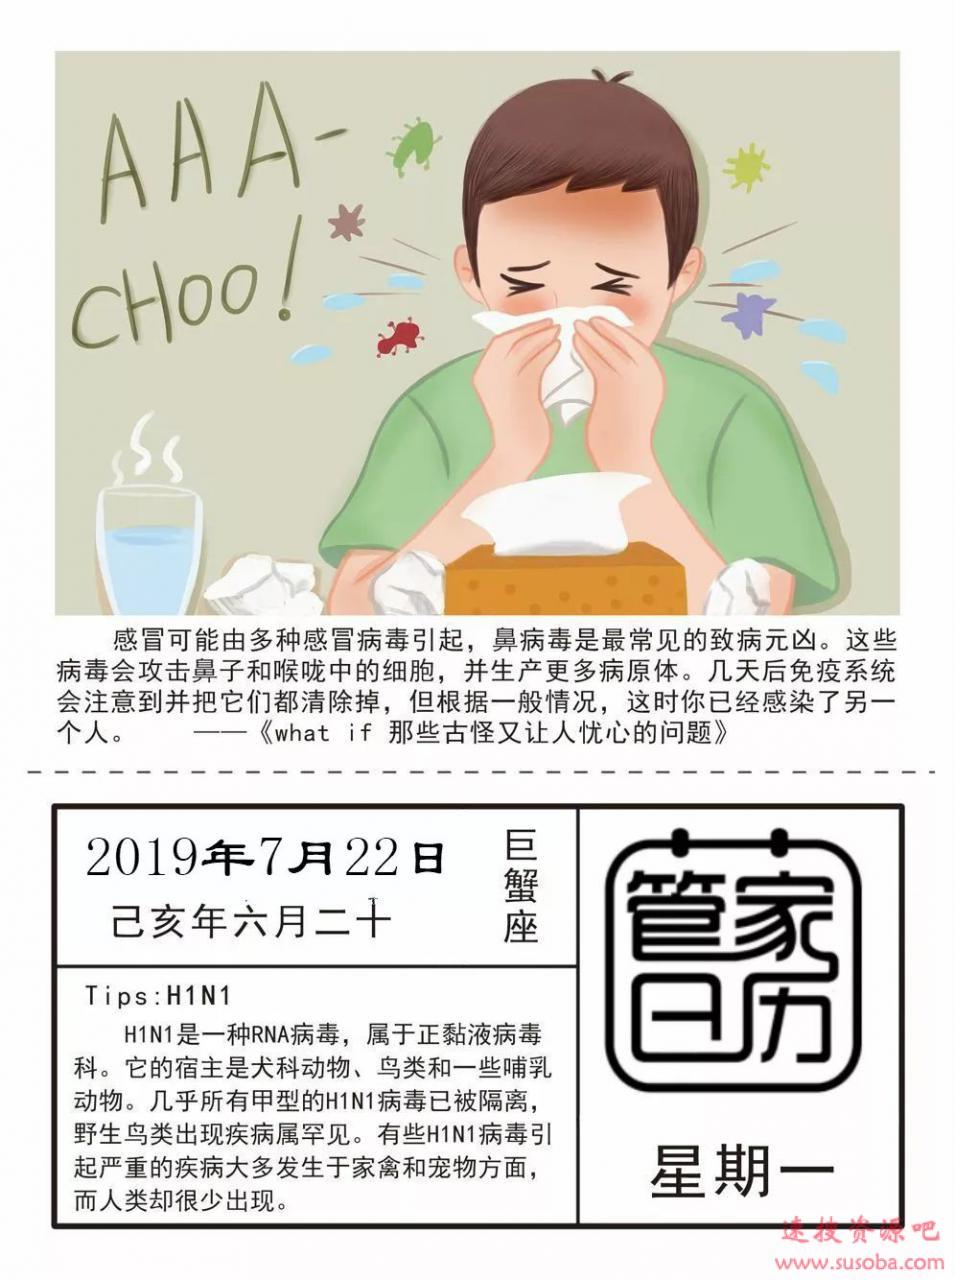 7月22日●星期一 | 感冒